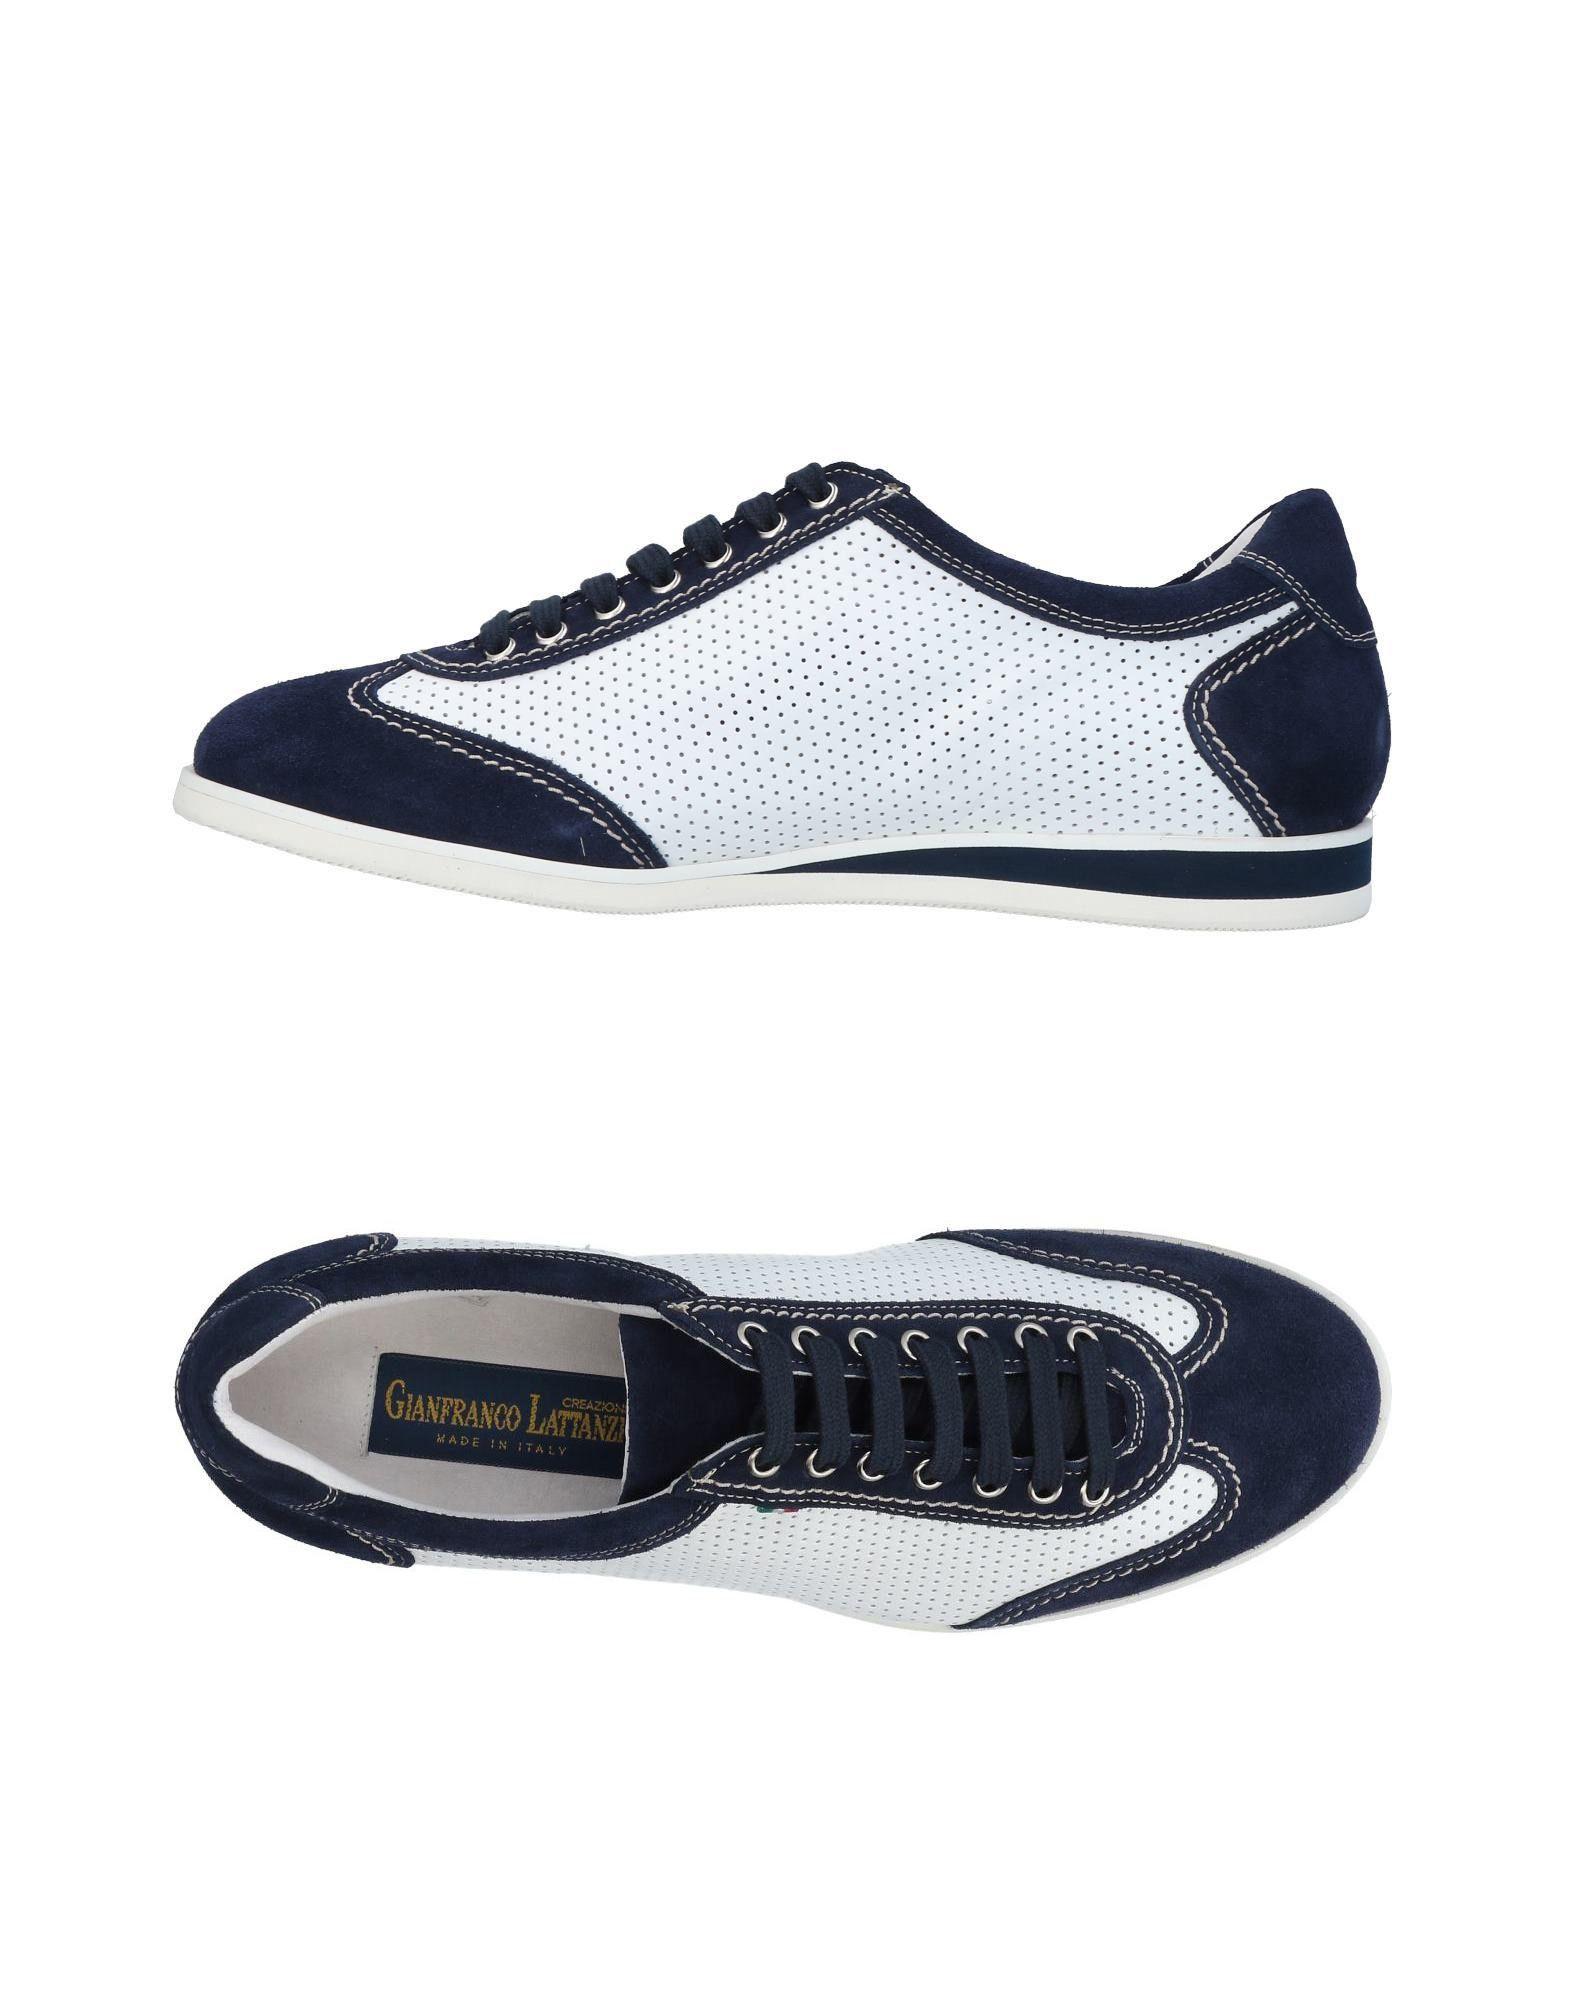 Sneakers Gianfranco Lattanzi Homme - Sneakers Gianfranco Lattanzi  Bleu foncé Chaussures casual sauvages